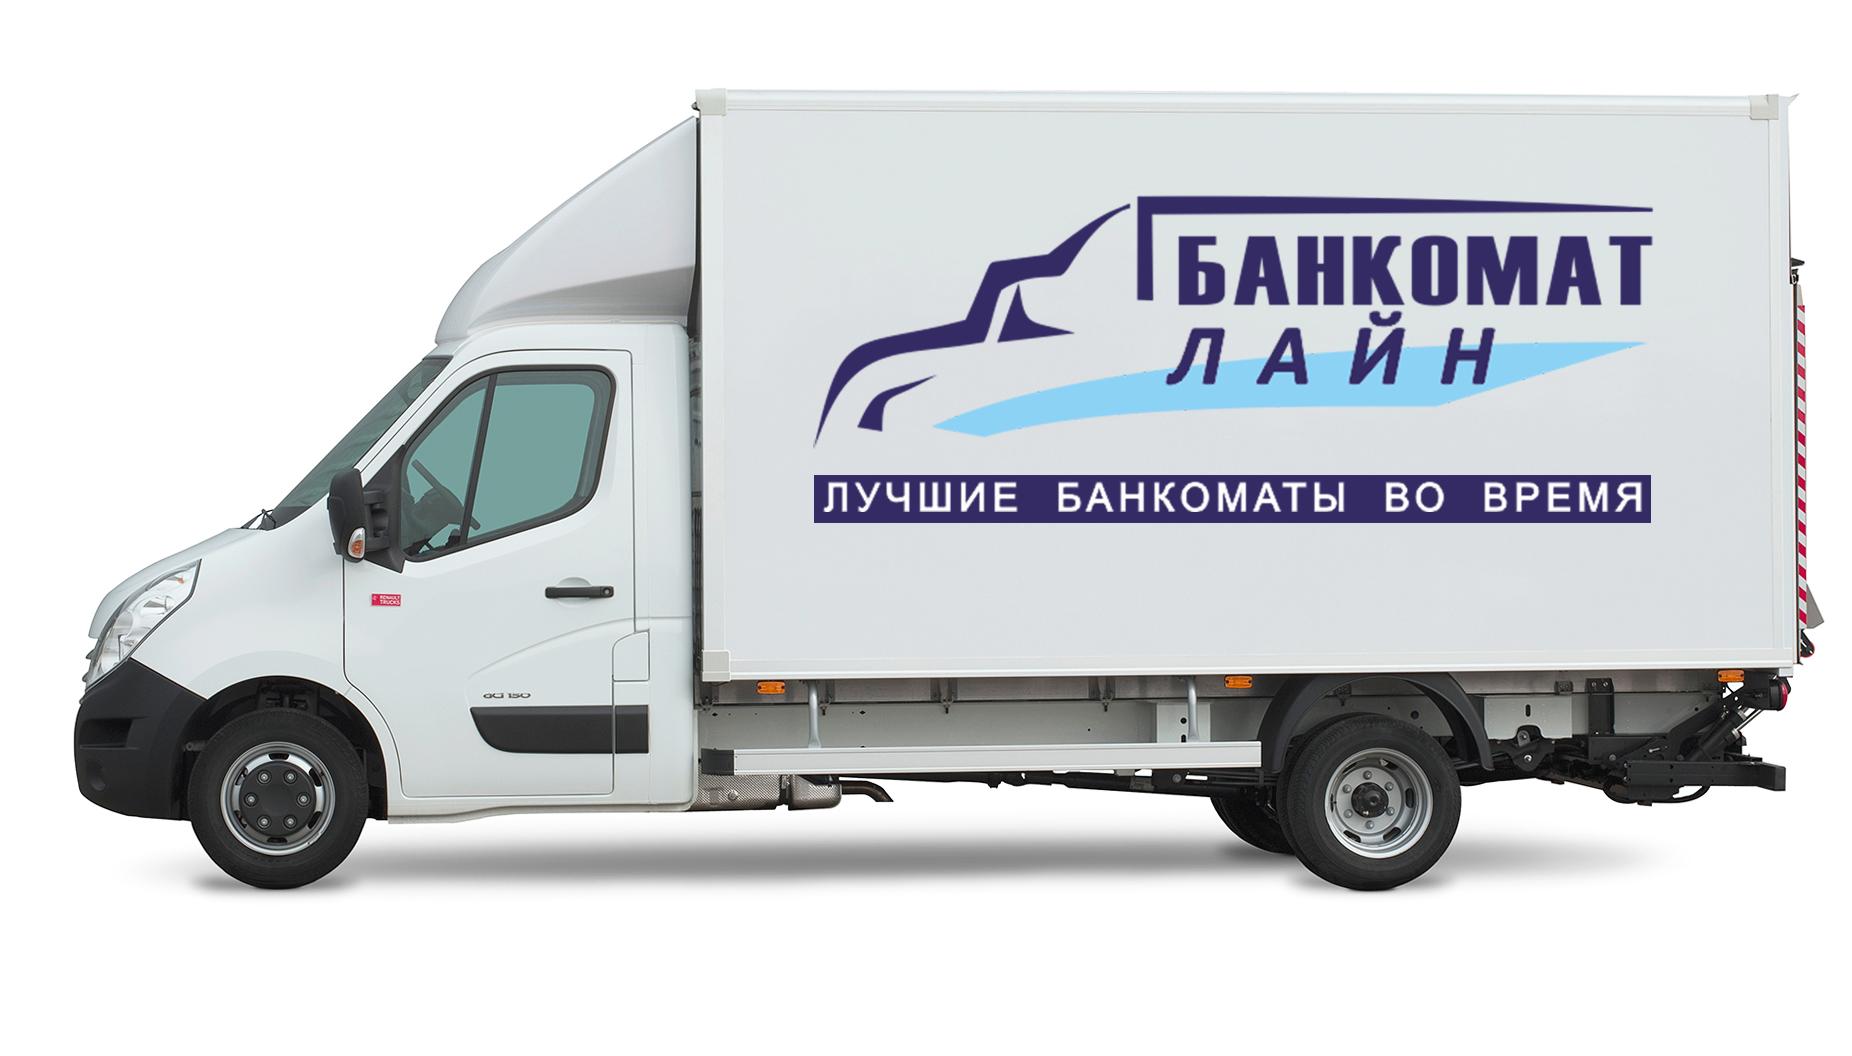 Разработка логотипа и слогана для транспортной компании фото f_4355878f1f8b1028.jpg